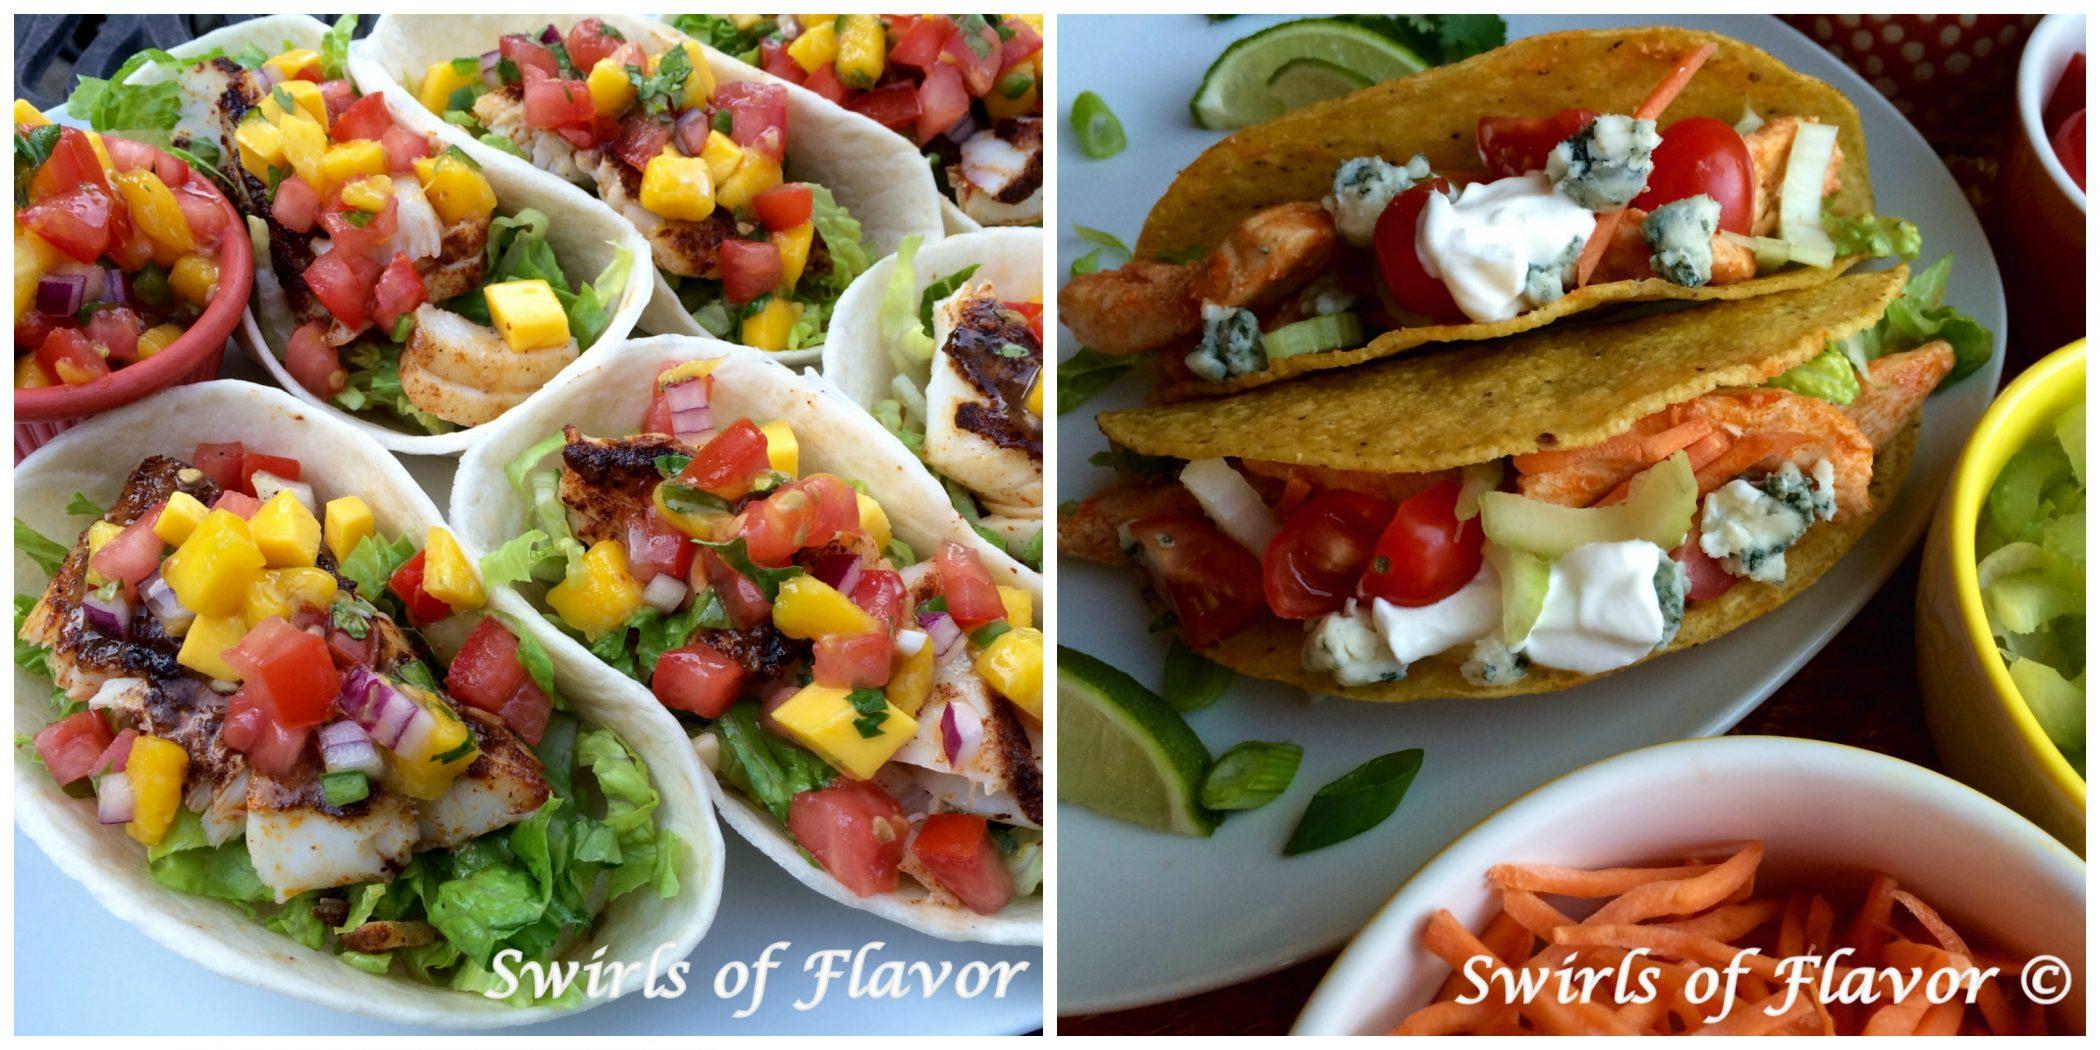 Fish Tacos and Buffalo Chicken Tacos